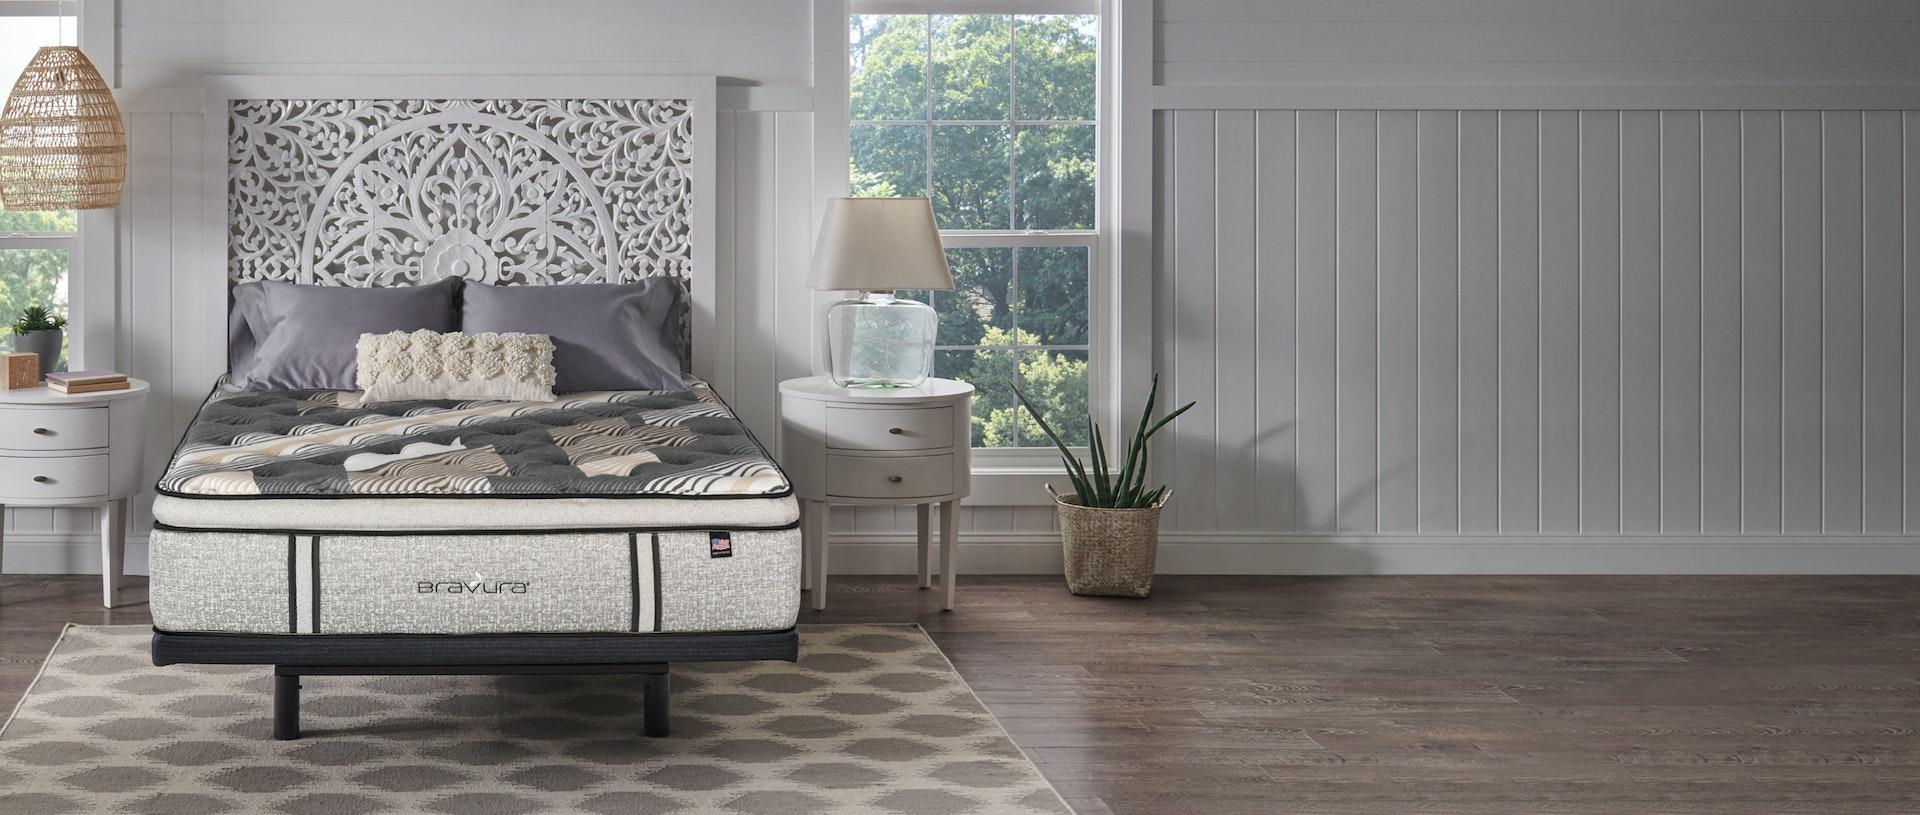 Bravura 2021 Mattress in a bedroom setting